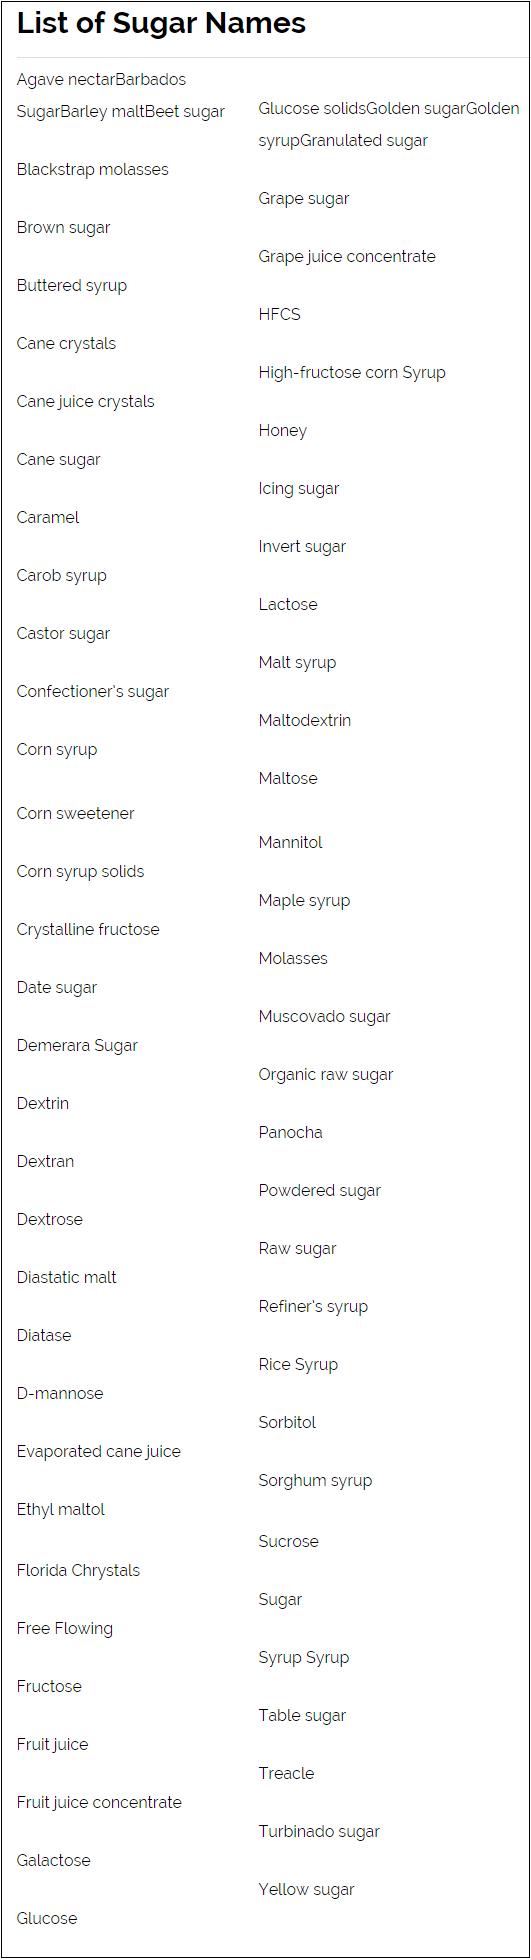 sugar_names_list_border